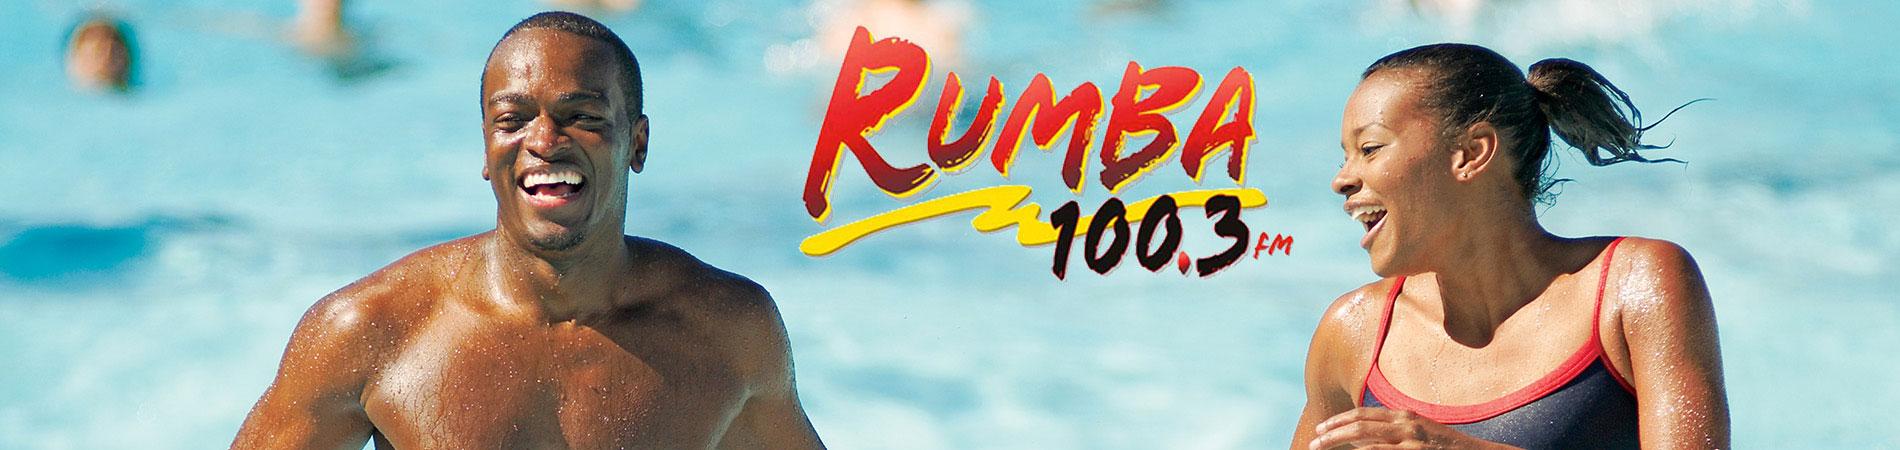 A Night at Aquatica Orlando Presented by Rumba 100.3 FM